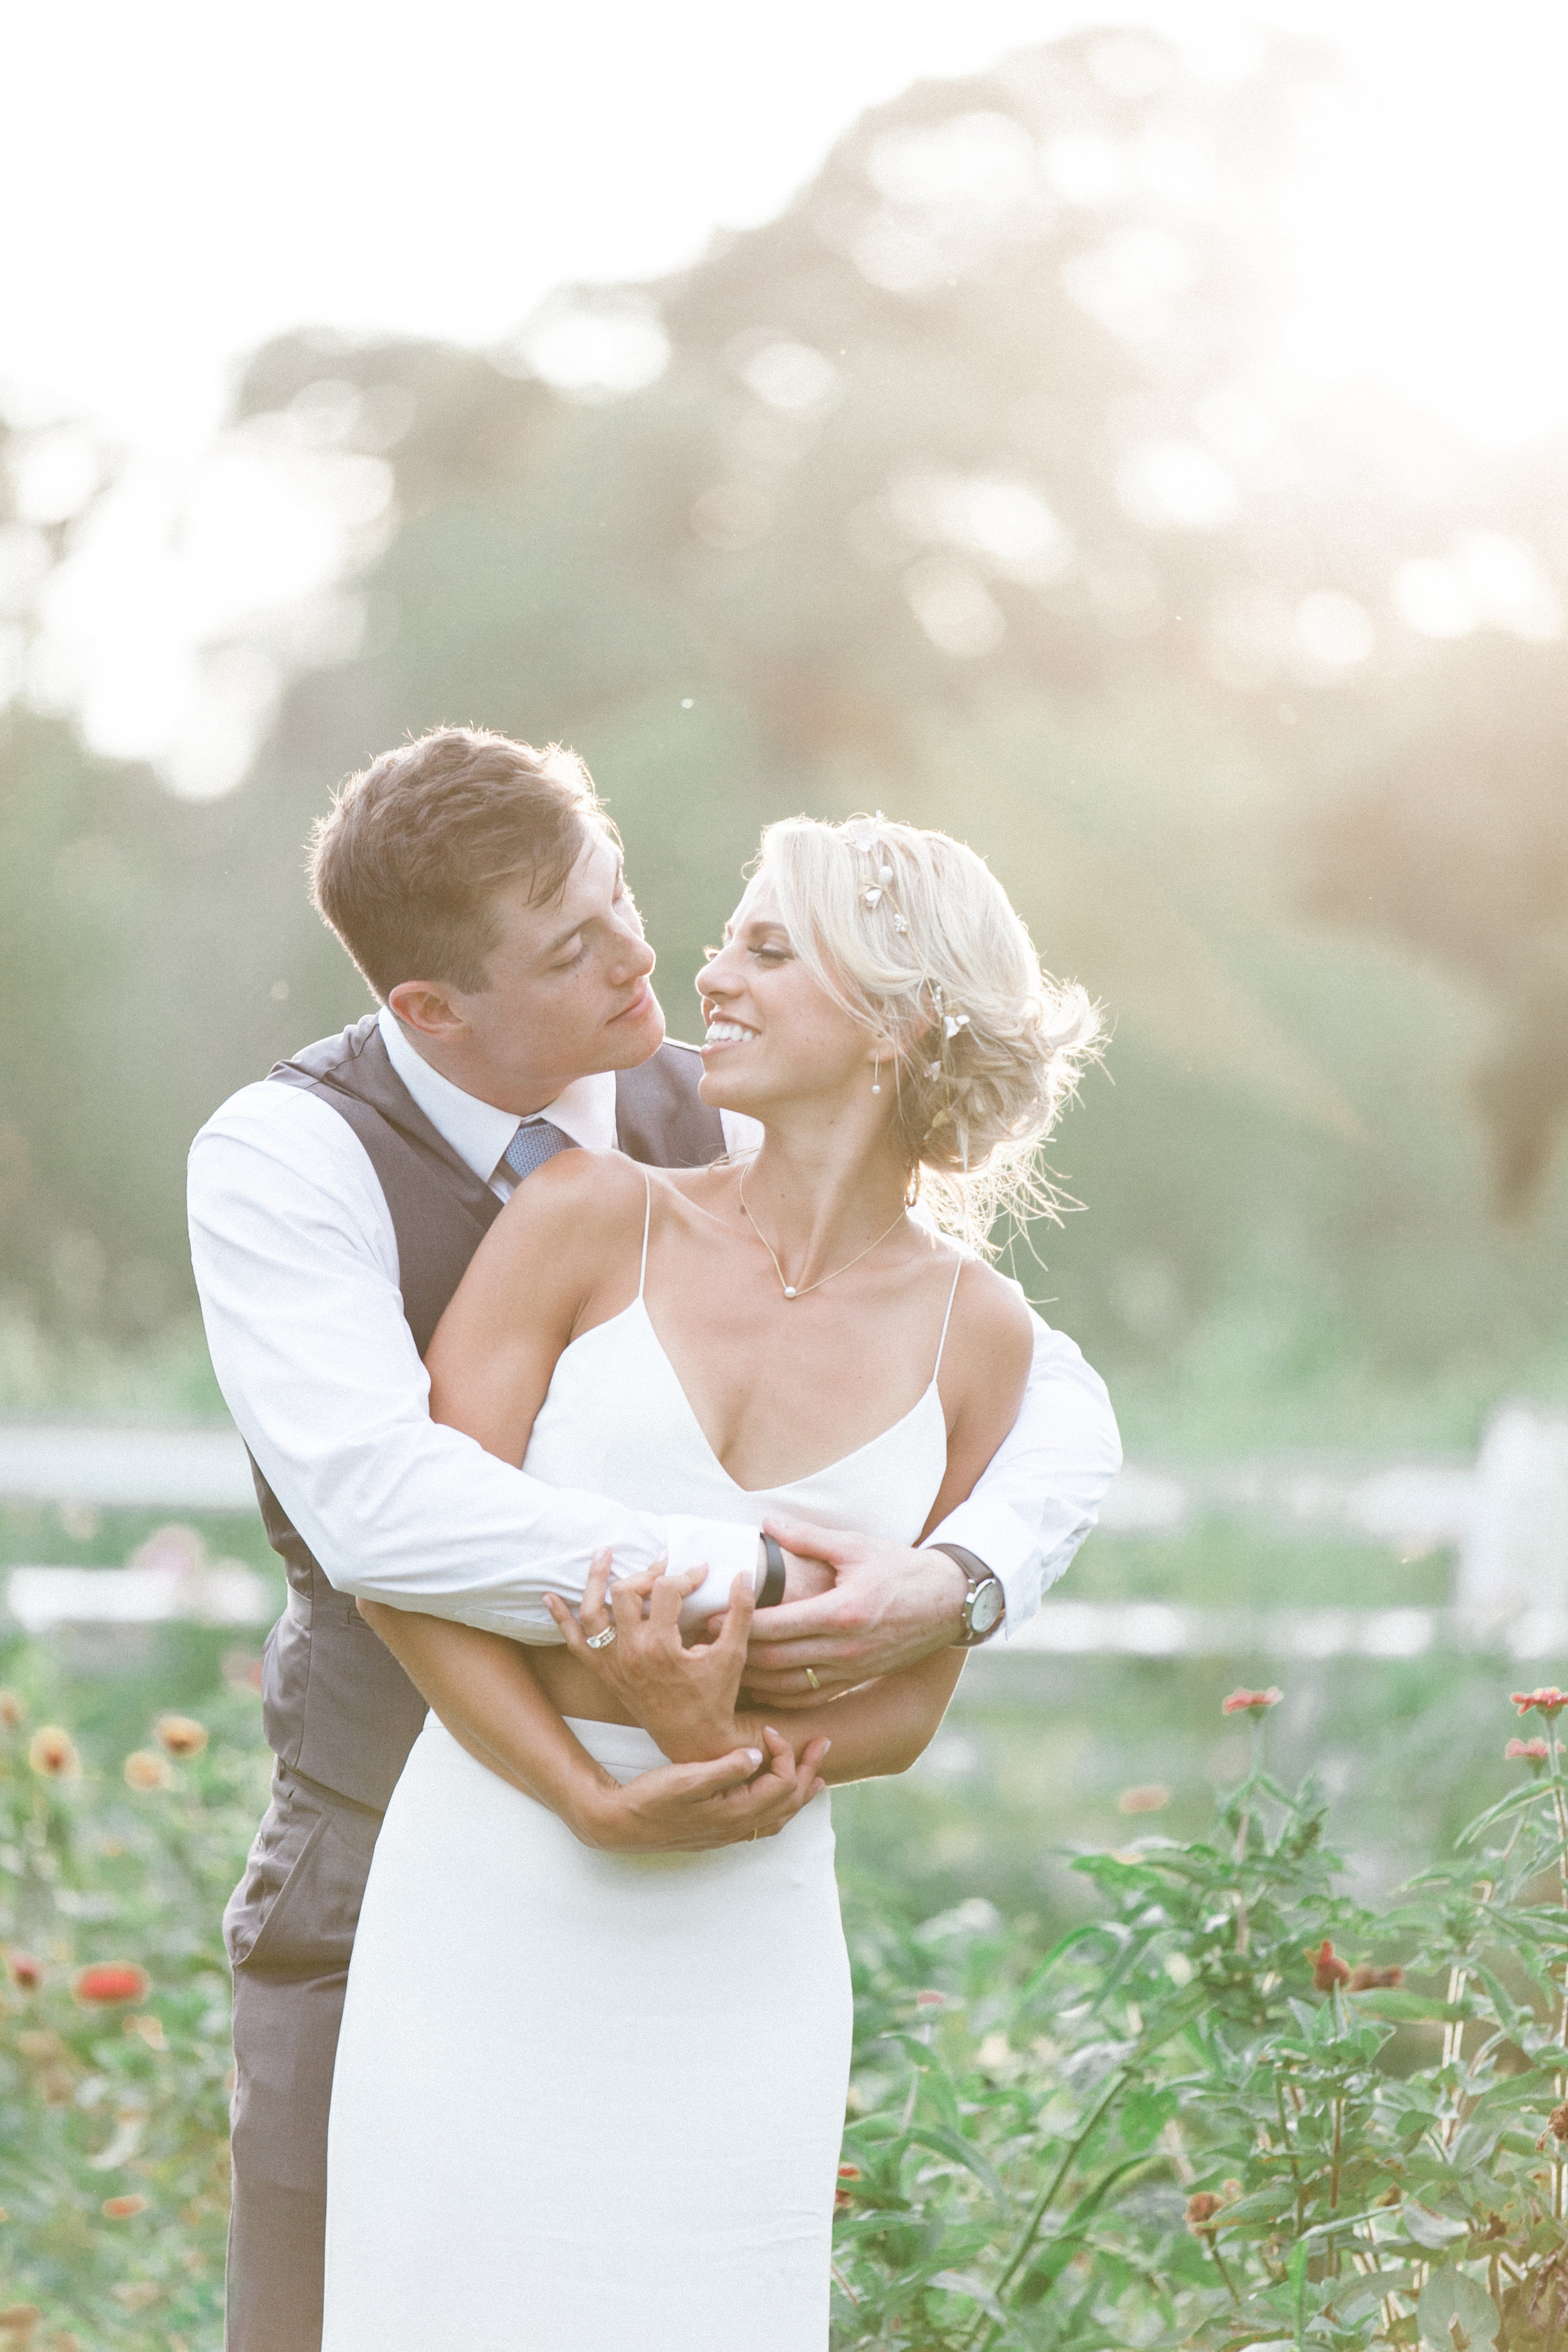 Barberry-Hill-Farm-Wedding-Madison-CT-Emily-and-Dan-August-2018-Connecticut-Wedd-0005.jpg